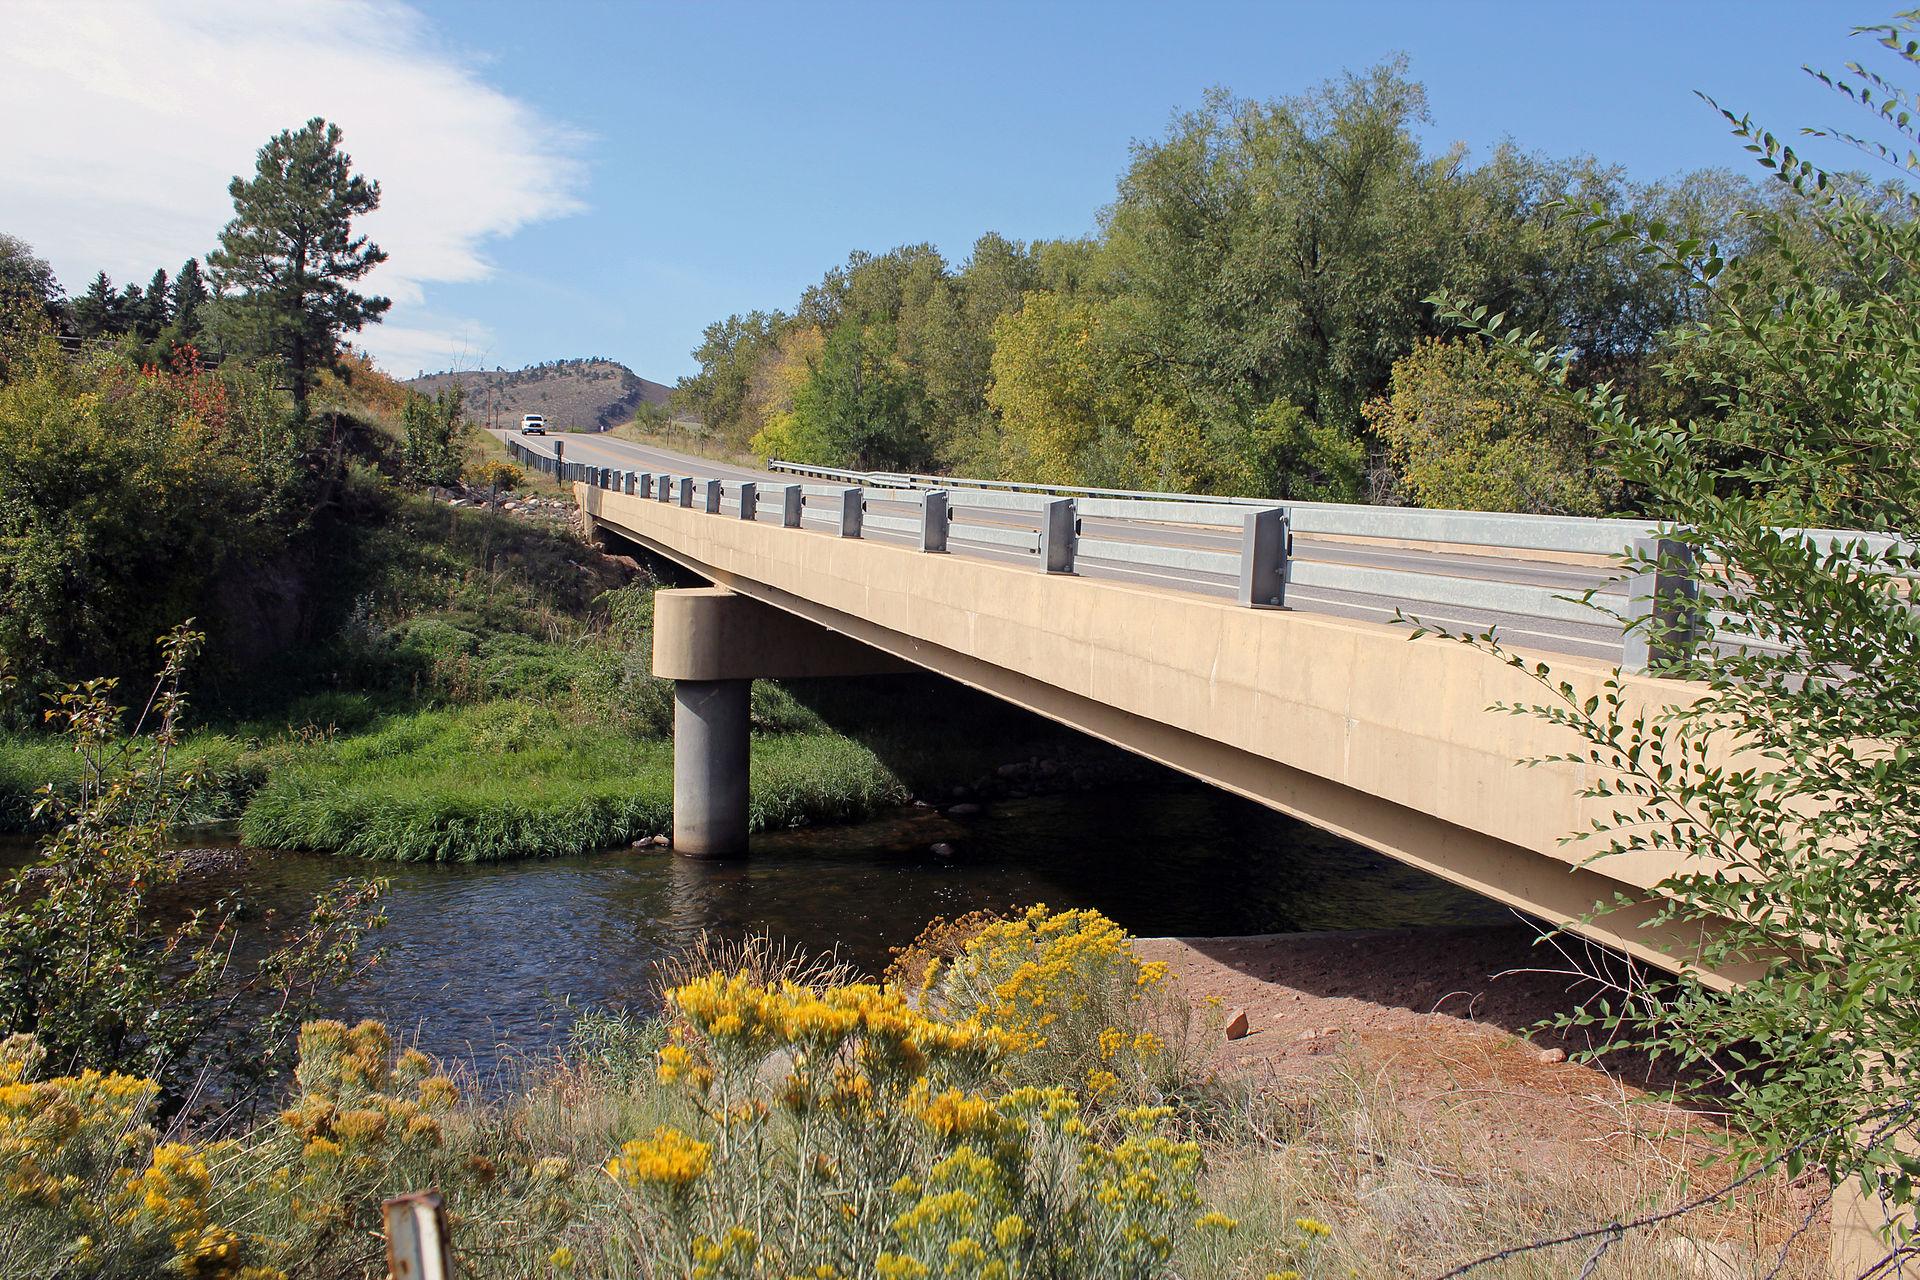 bridge on the river - photo #30